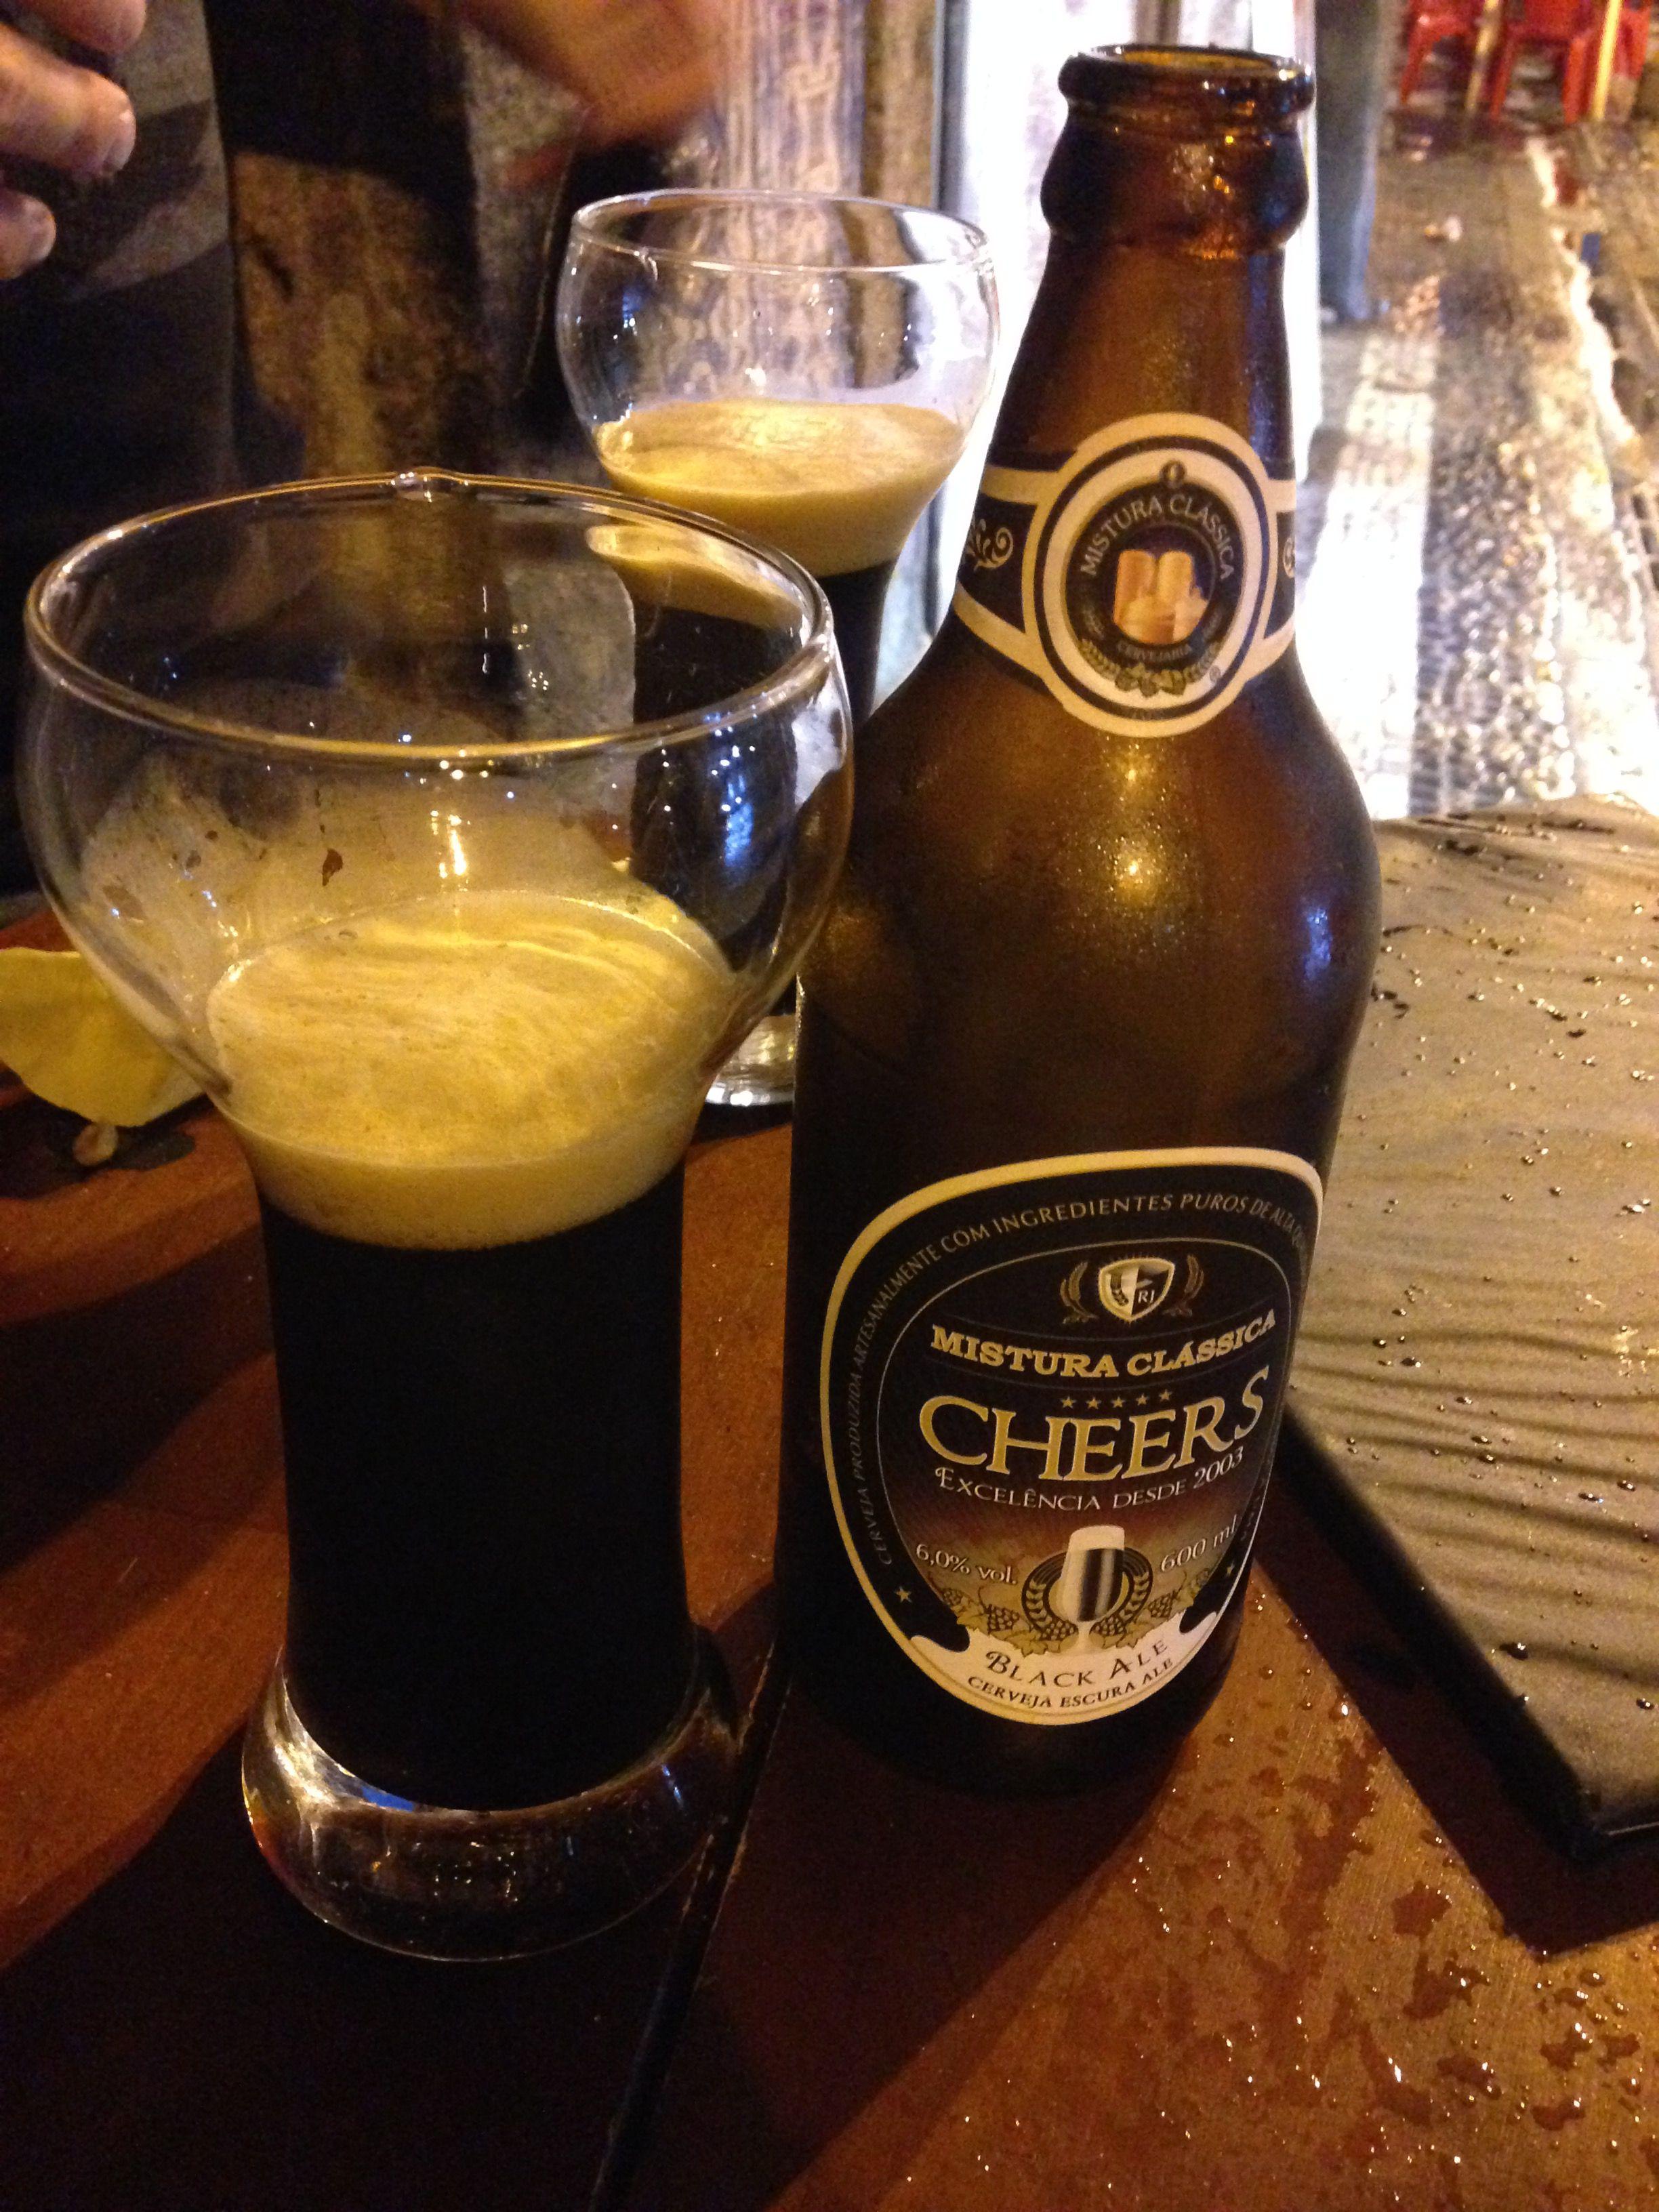 #092 | Mistura Clássica Cheers Black Ale (Volta Redonda / RJ, Brasil)